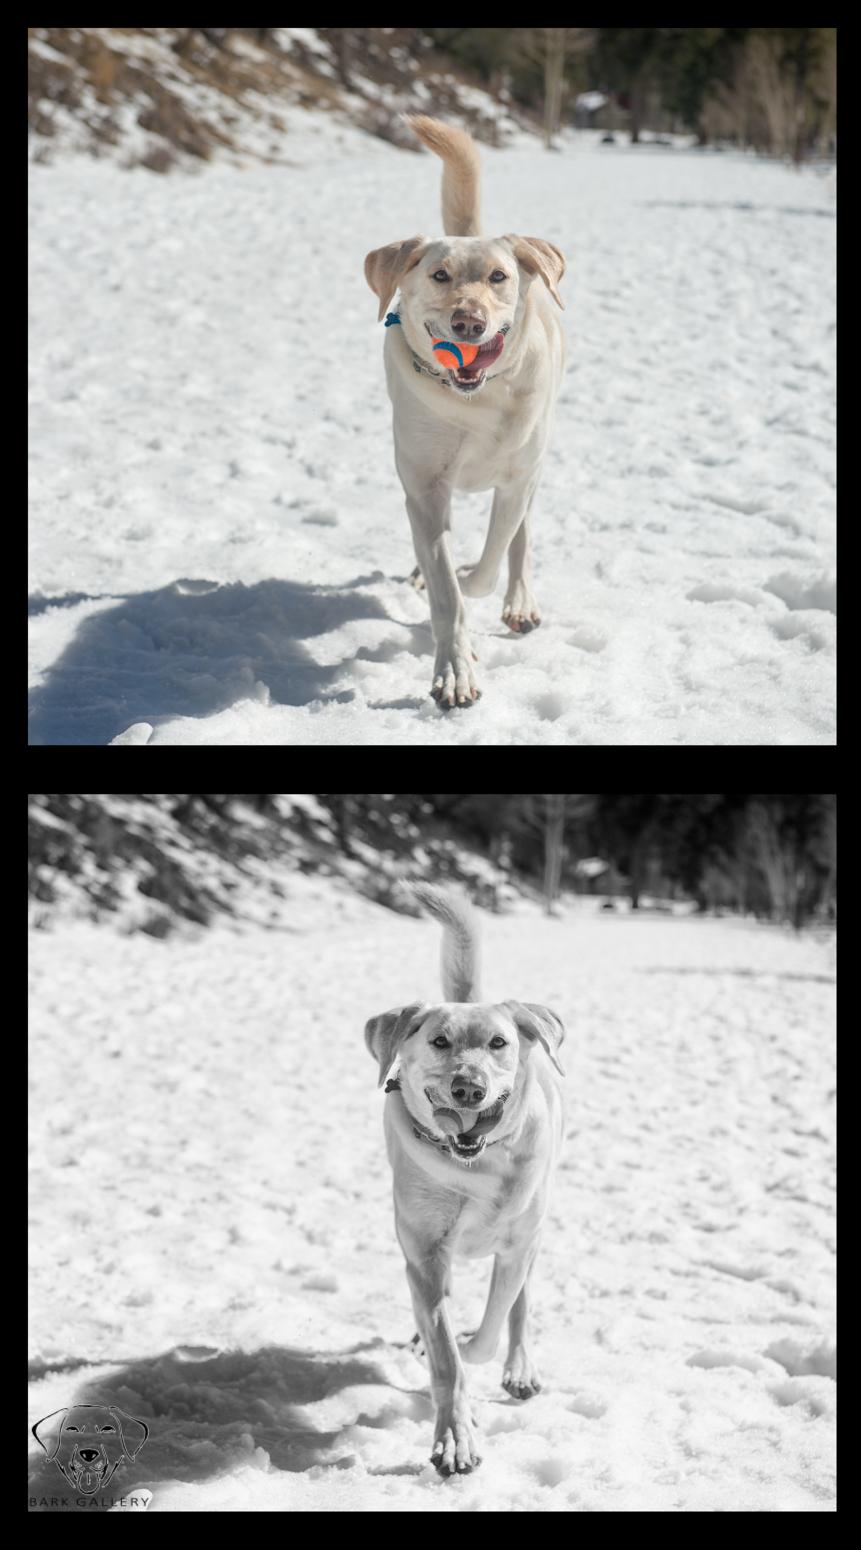 bear-bark-gallery-bw-color-comparison